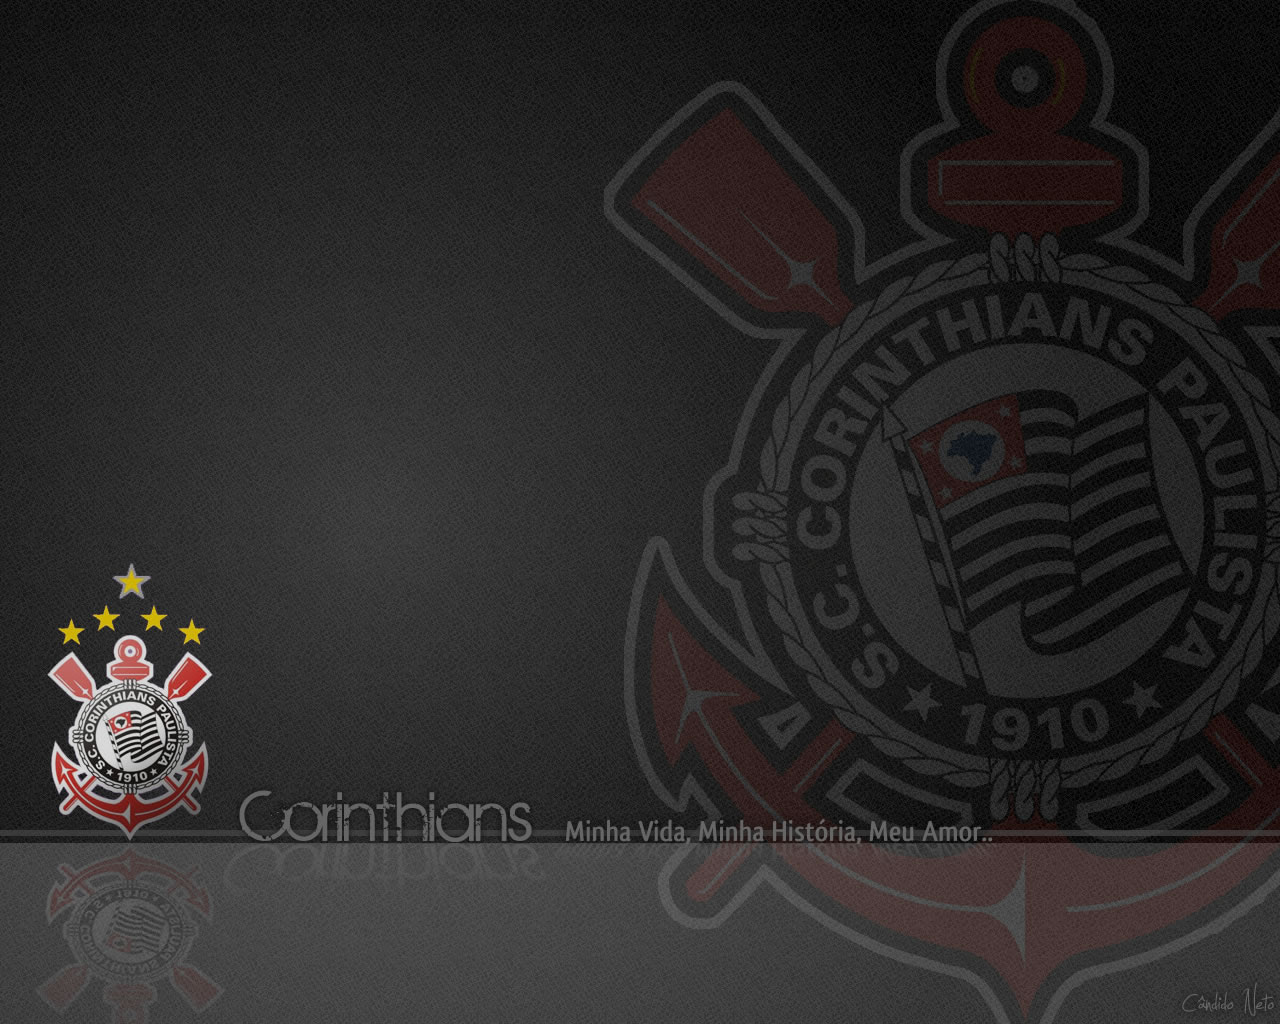 http://1.bp.blogspot.com/-MzY-UzOhBjo/Tna7JC5W0gI/AAAAAAAAACg/1KvS7WpNm0Q/s1600/Corinthians+Wallpapers+35.jpg